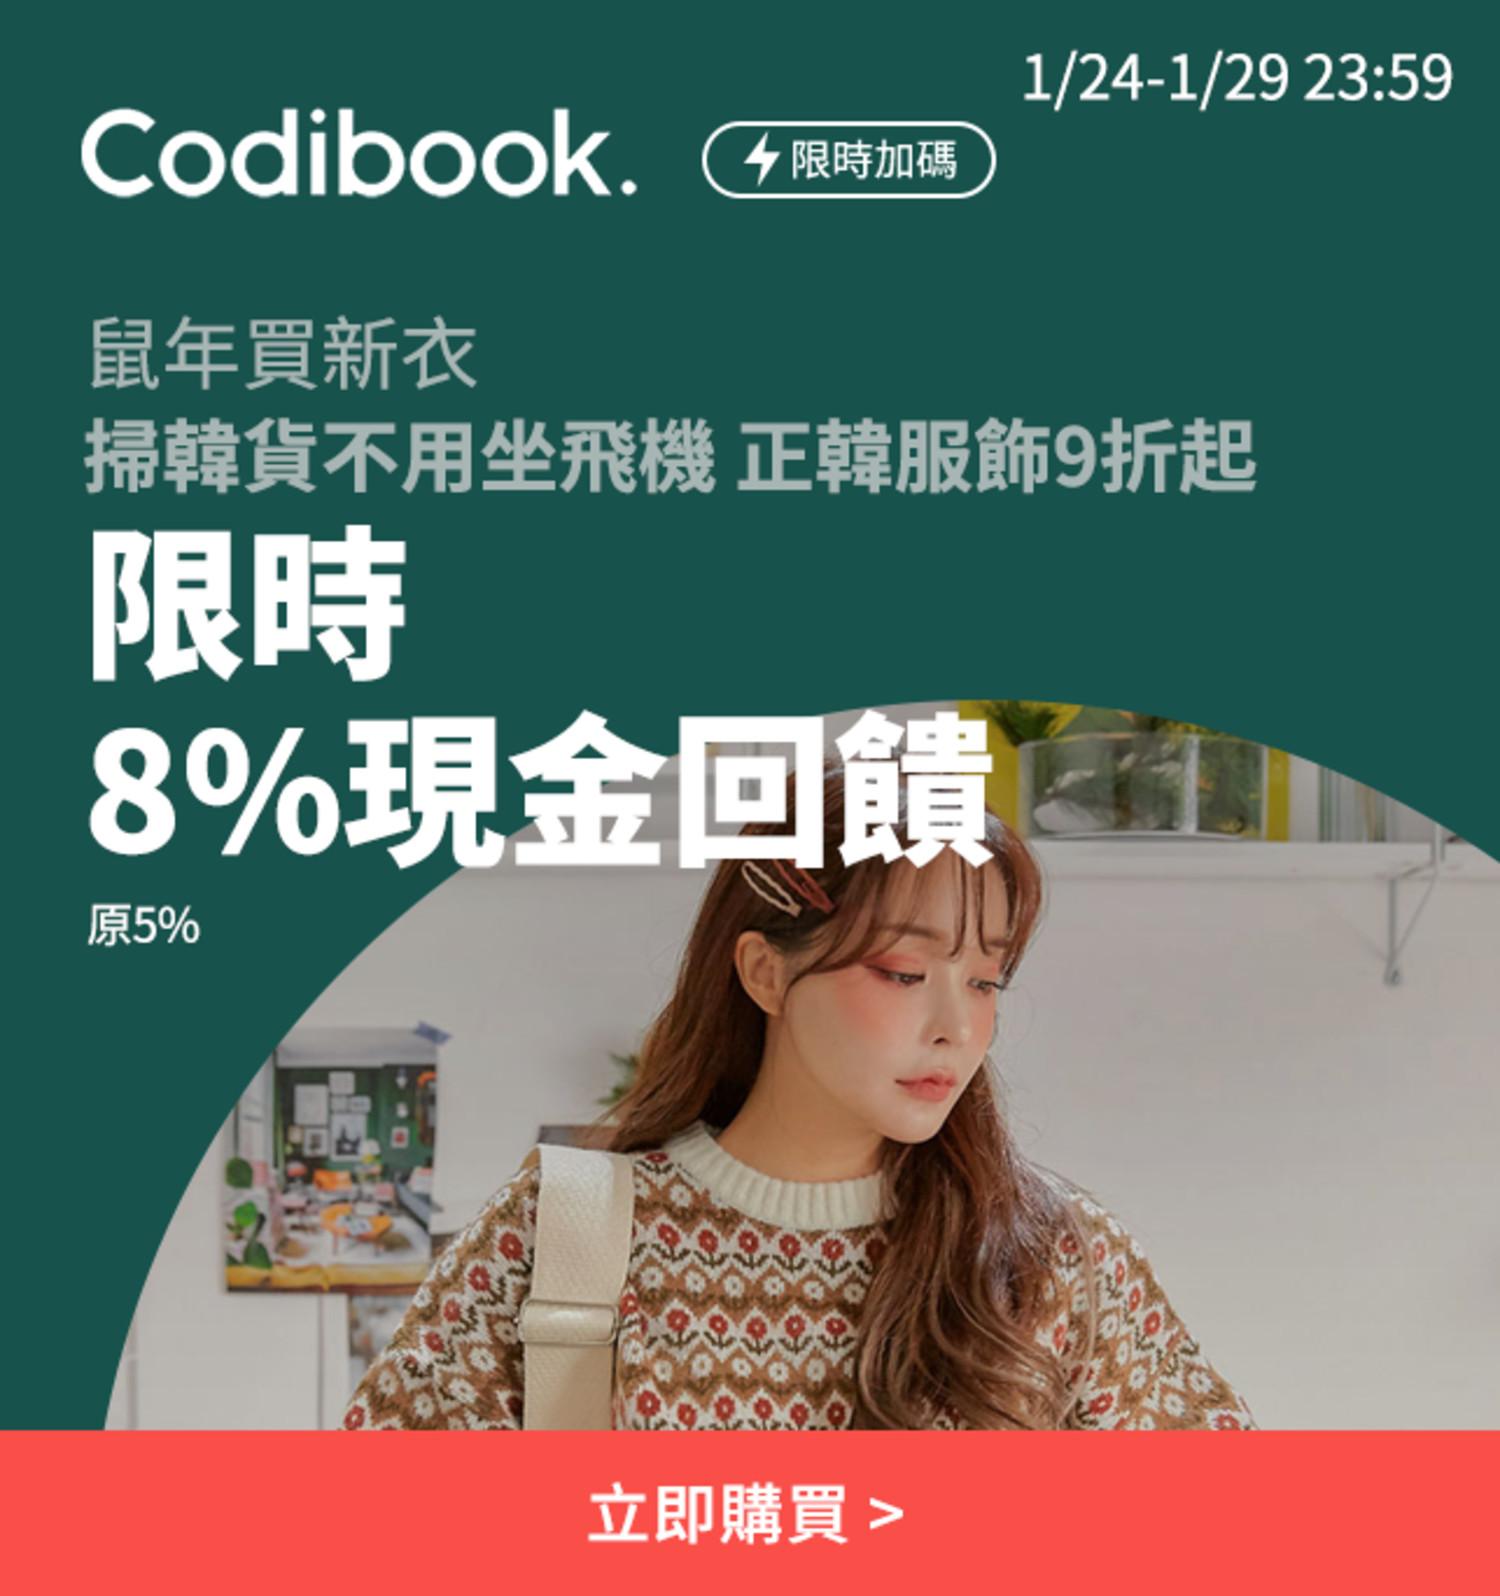 Codibook 1/24-1/29